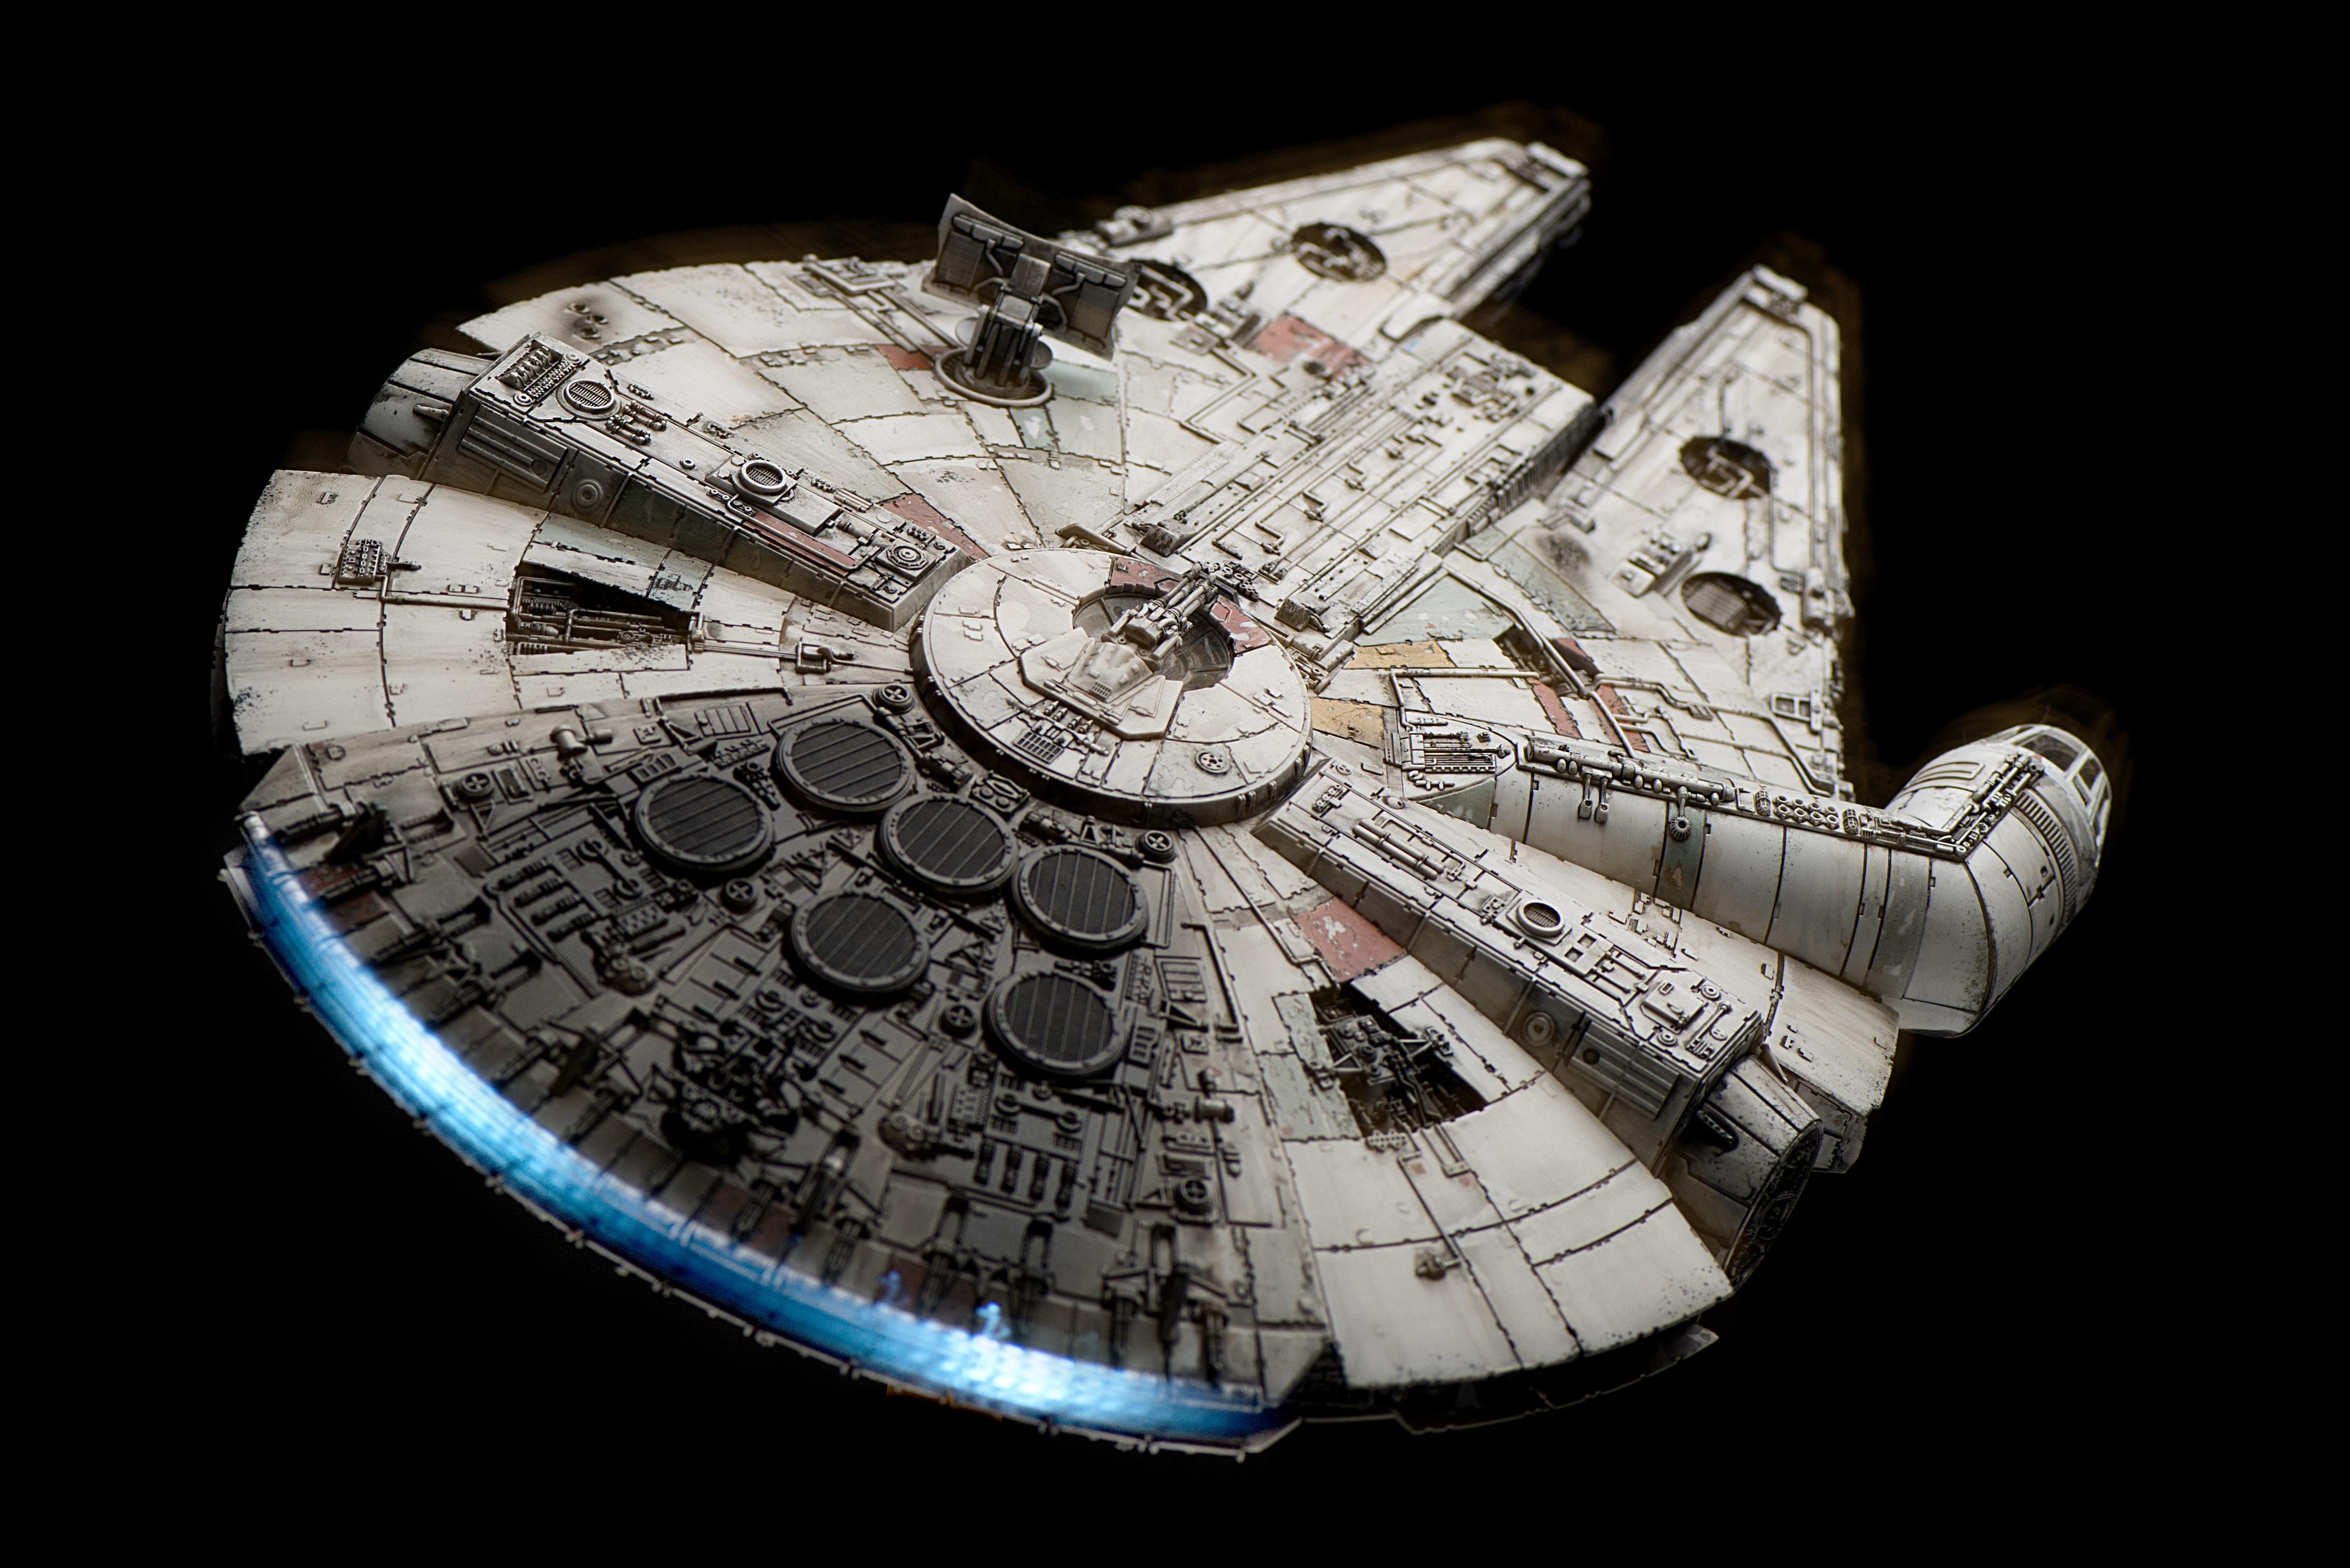 bandai x star wars the force awakens 1 144 millennium. Black Bedroom Furniture Sets. Home Design Ideas